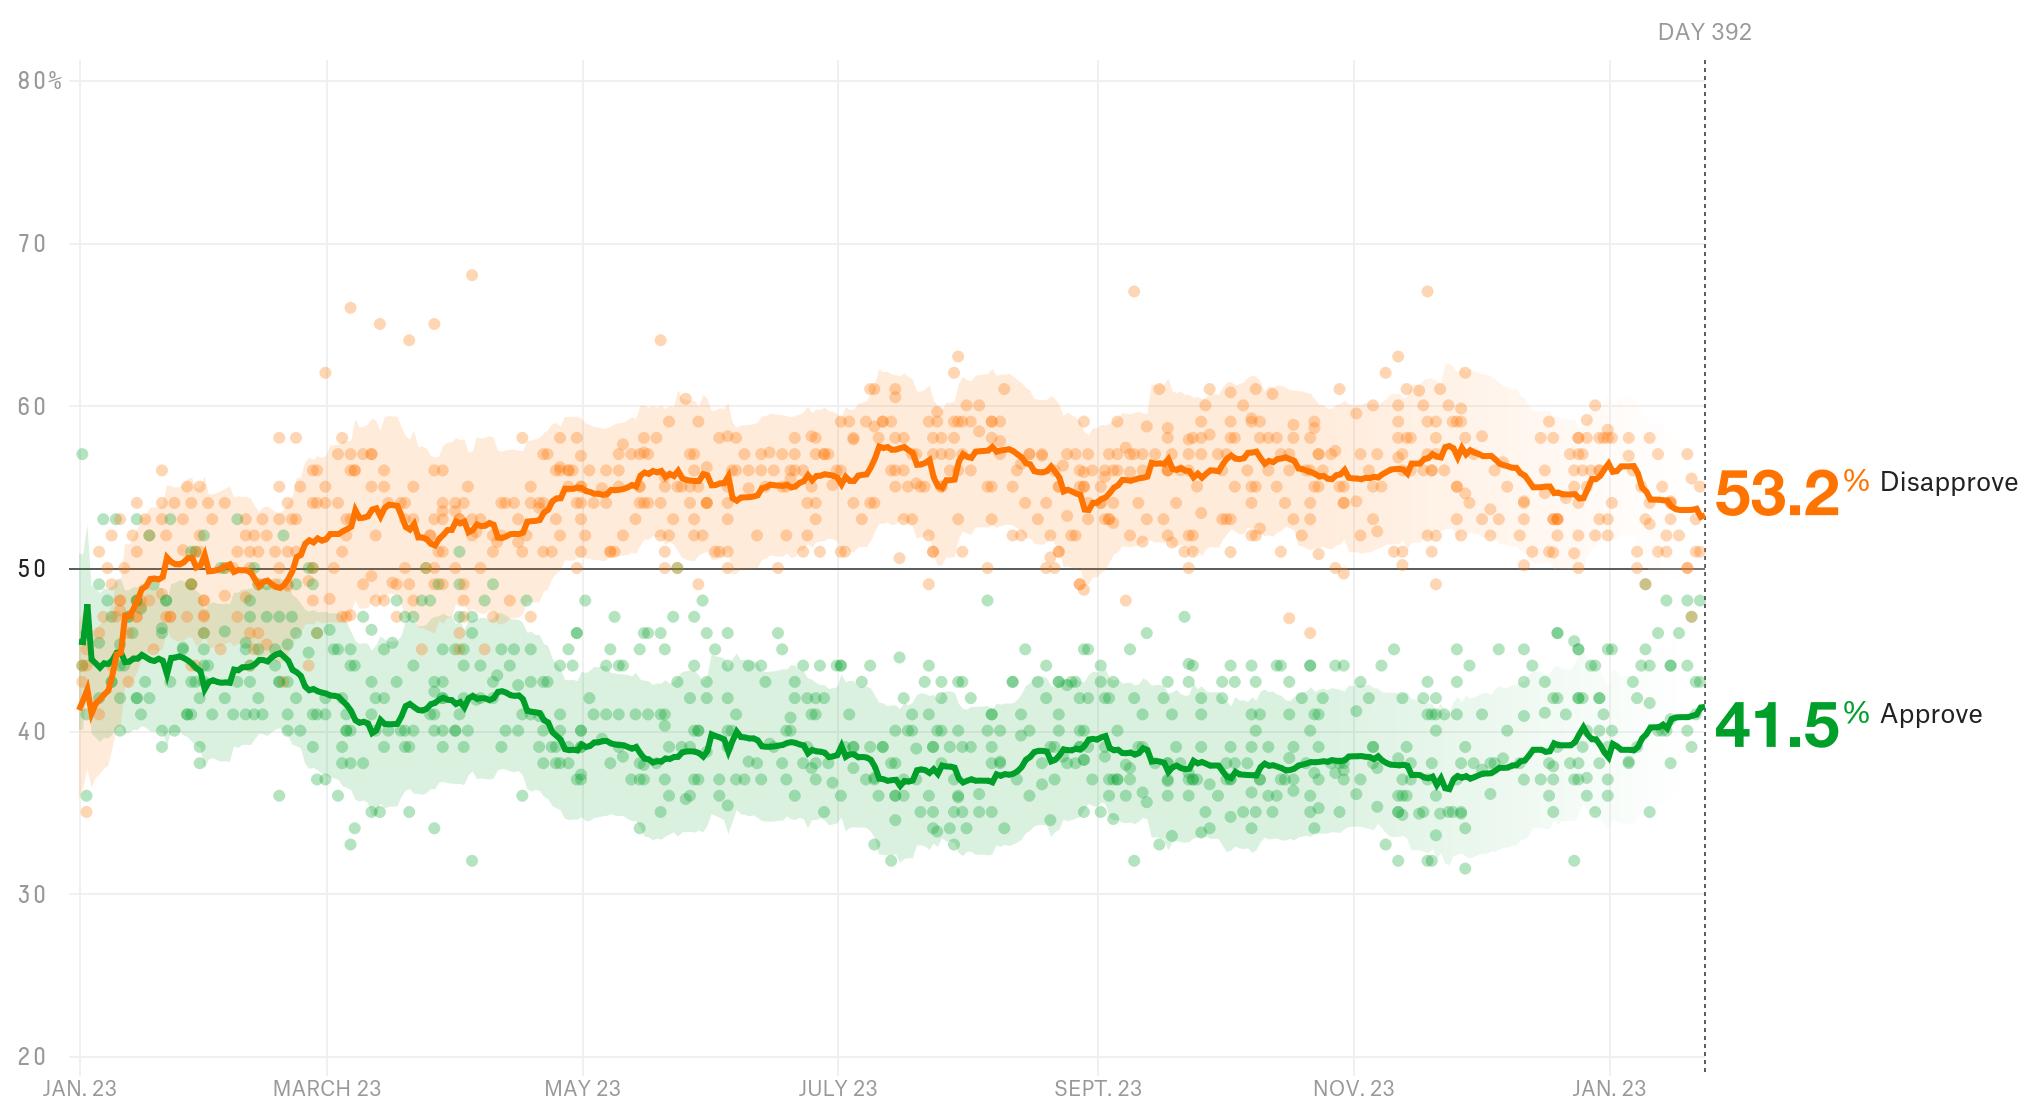 Trump's job approval rating